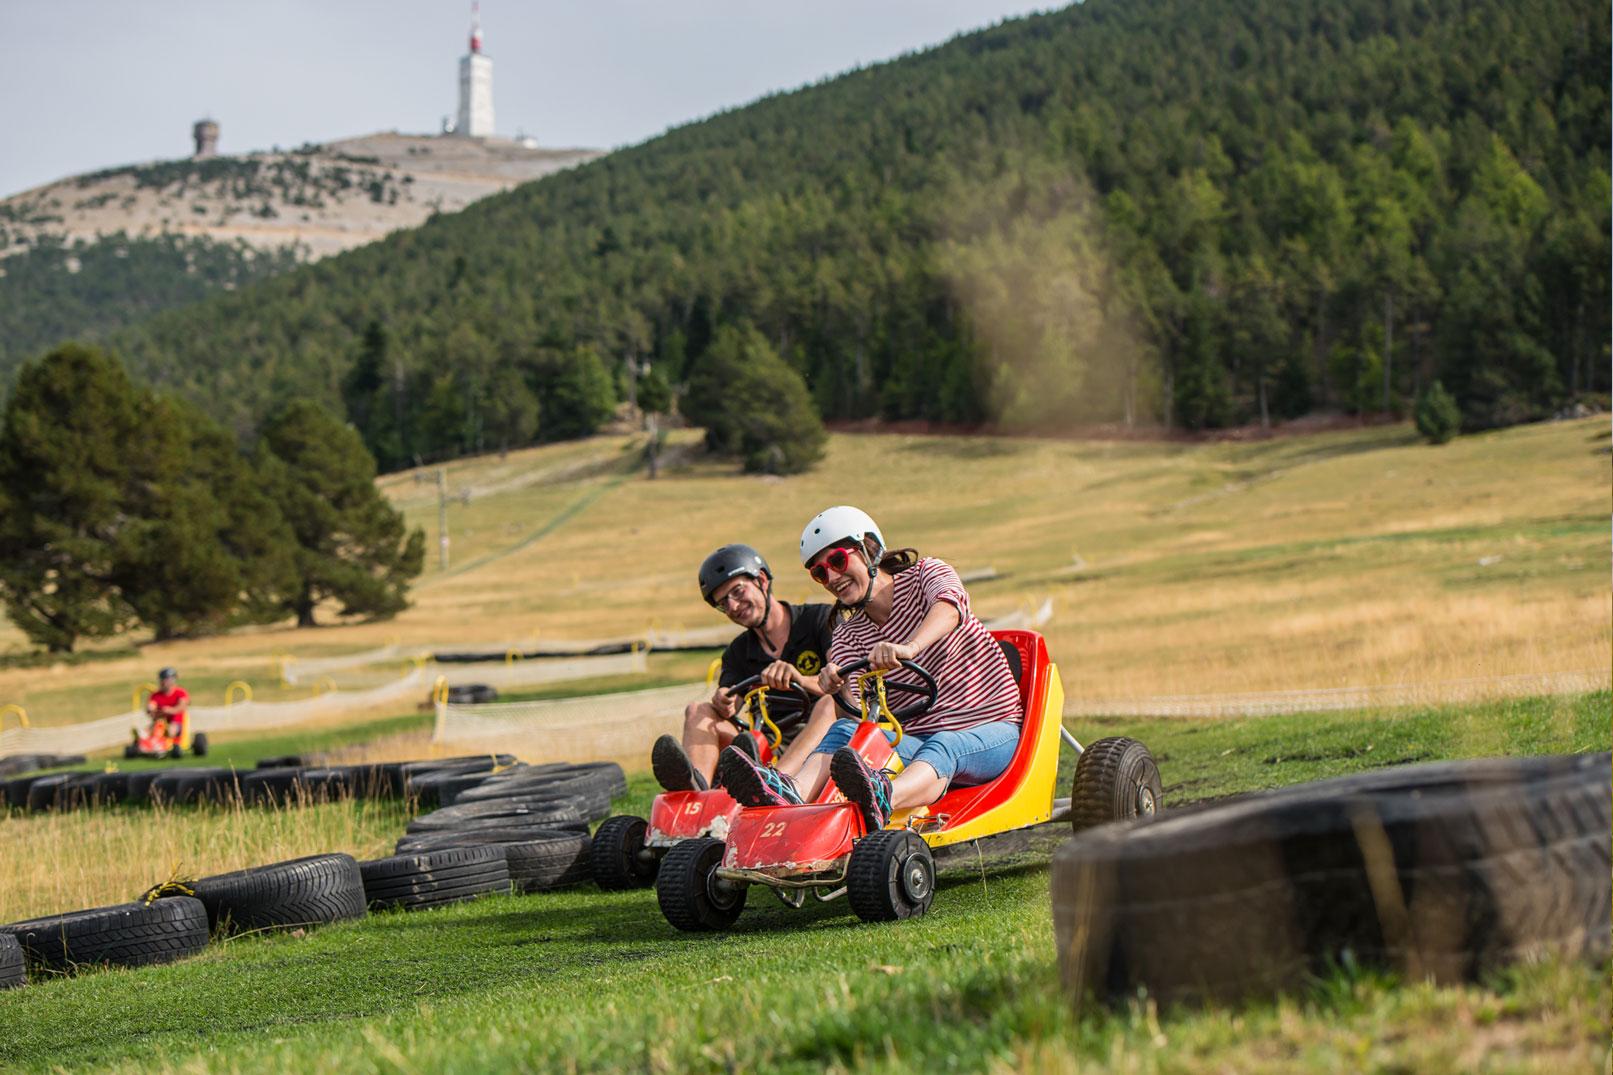 Mont Ventoux summer outdoor activities @ ODD Bird